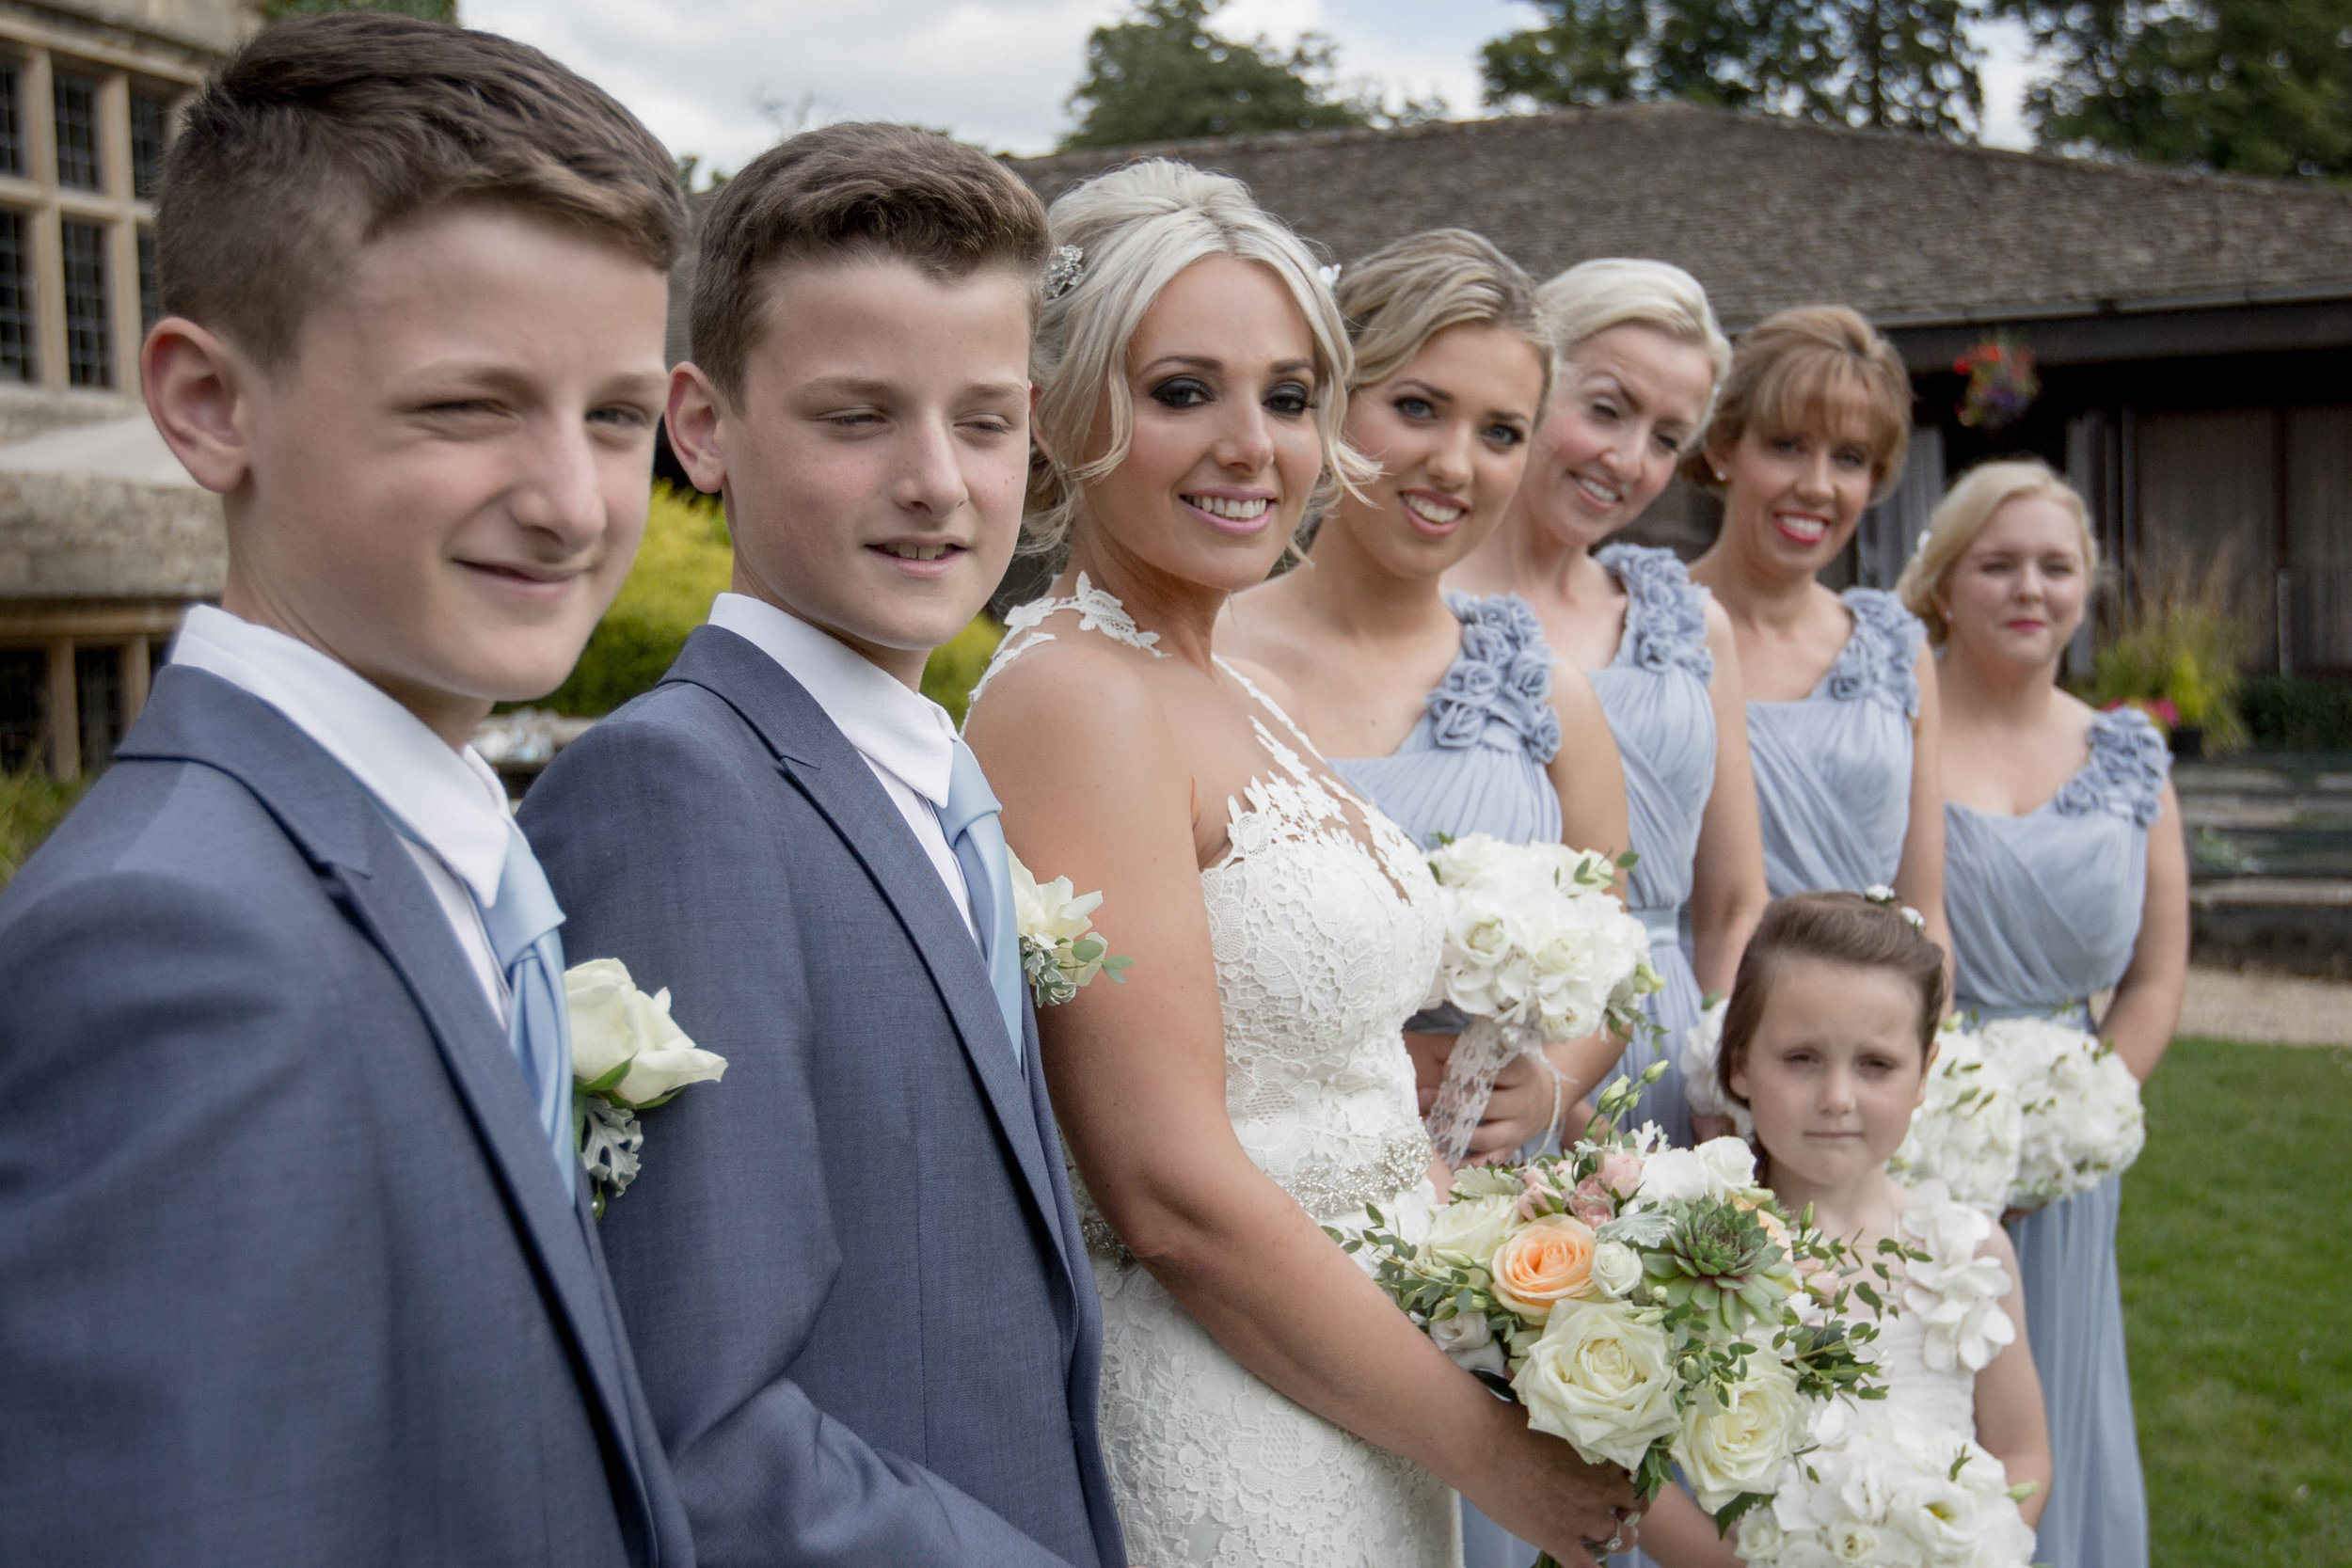 cotswold-wedding-photography-at-stonehouse-court-hotel-natalia-smith-photography-gloucestershire-wedding-photographer-32.jpg